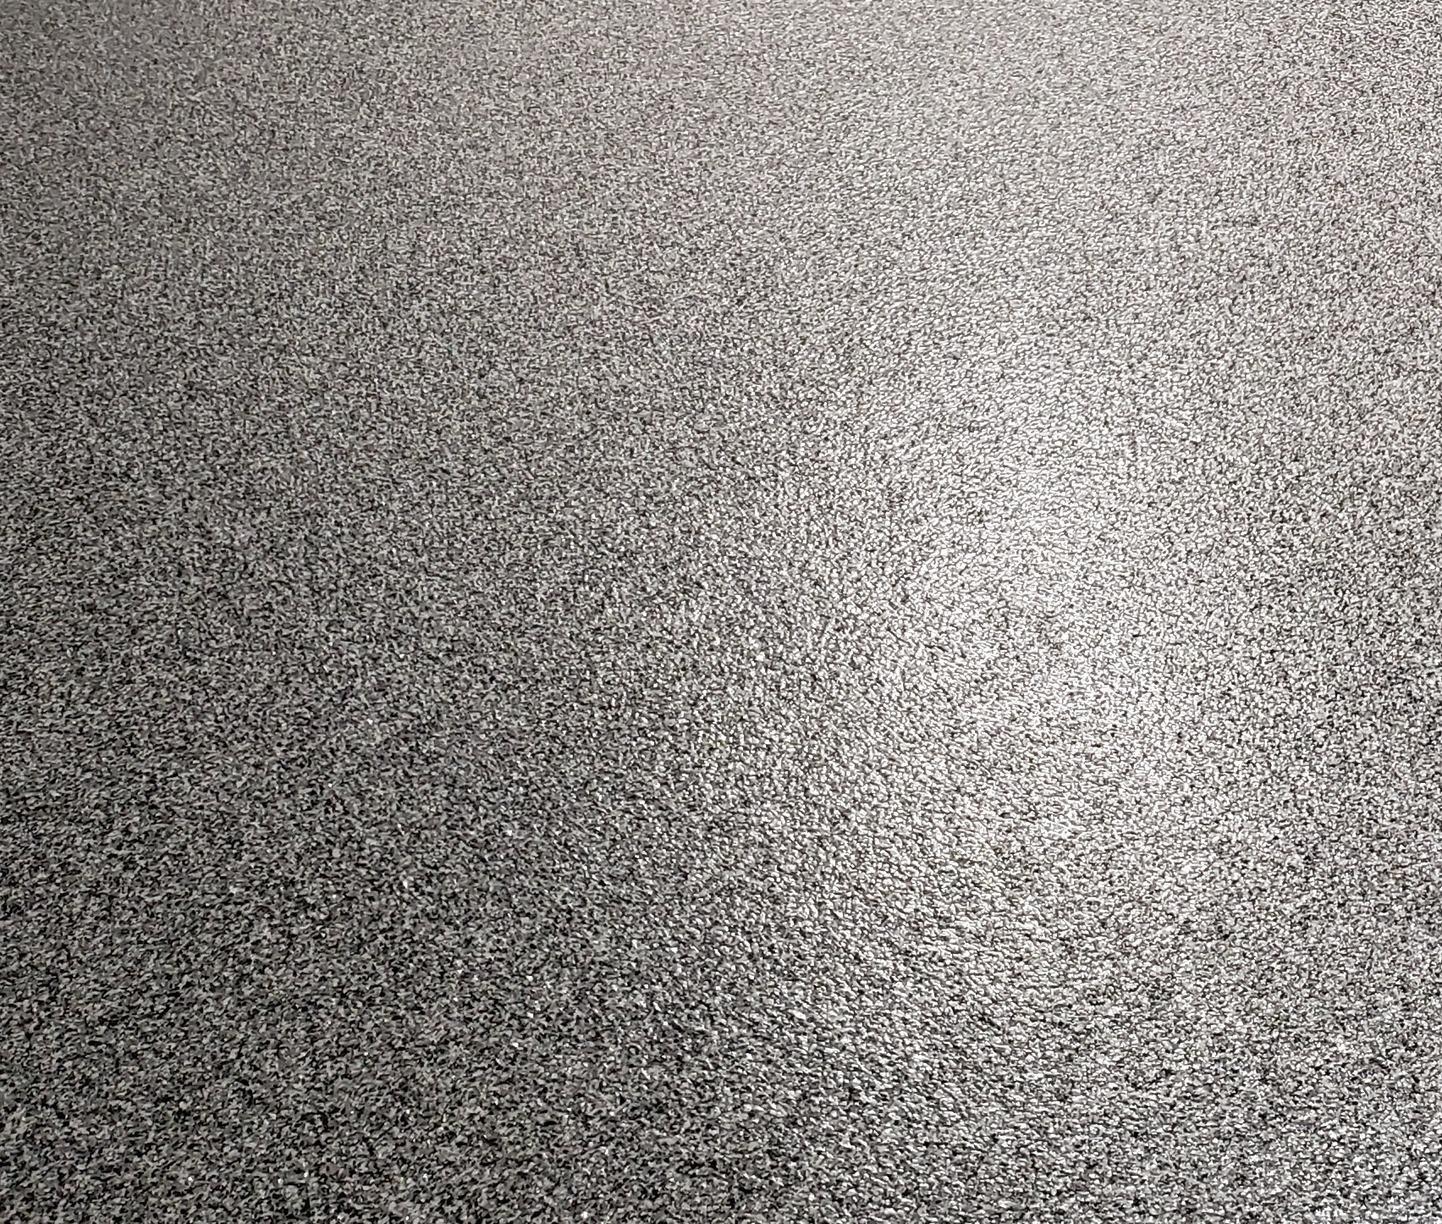 Garage Floor Coating Service in La Vista, NE - After Photo